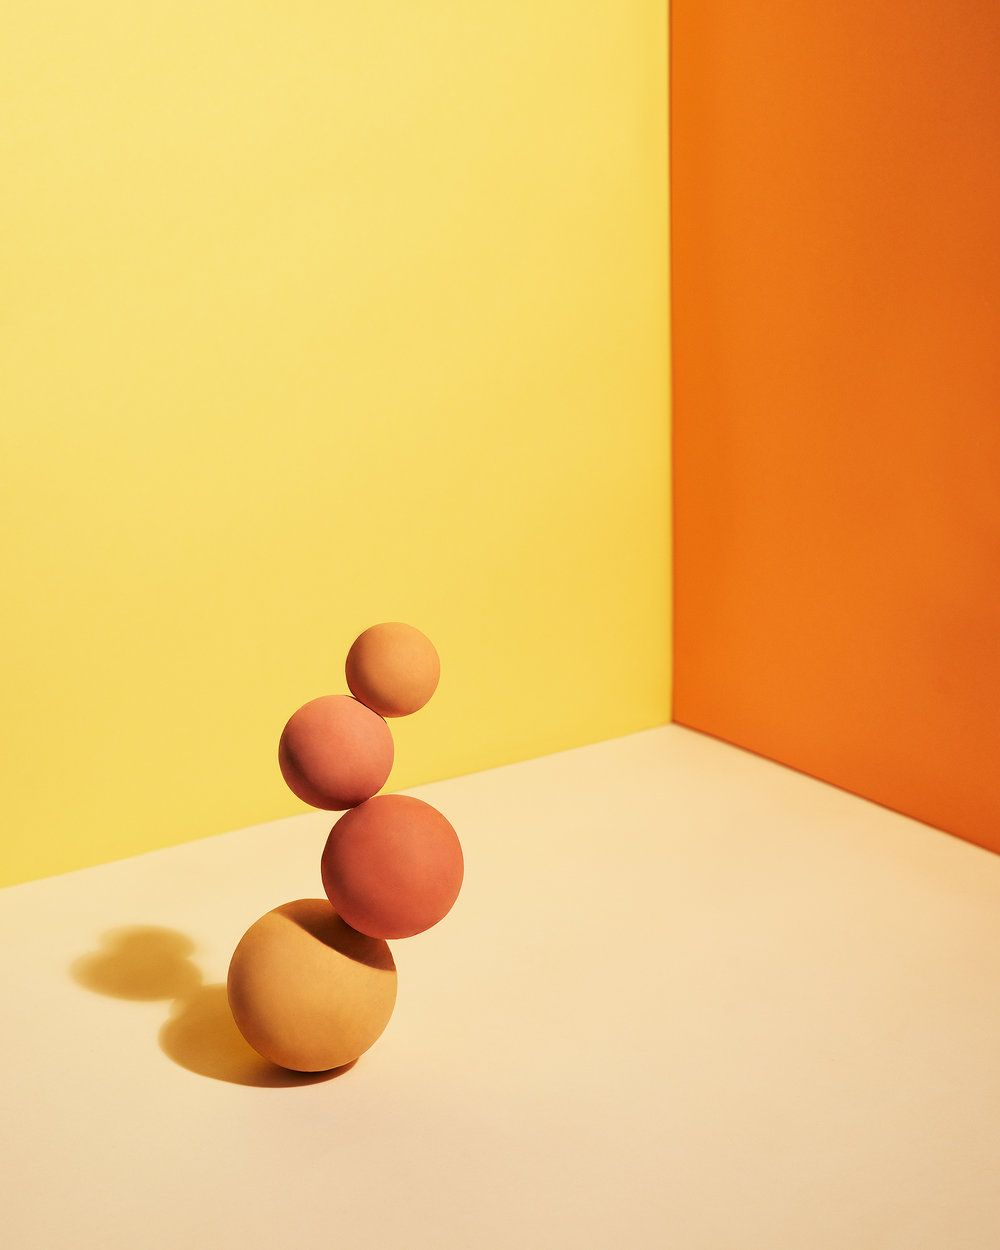 Still Life by Photographer Amanda Nilsson.